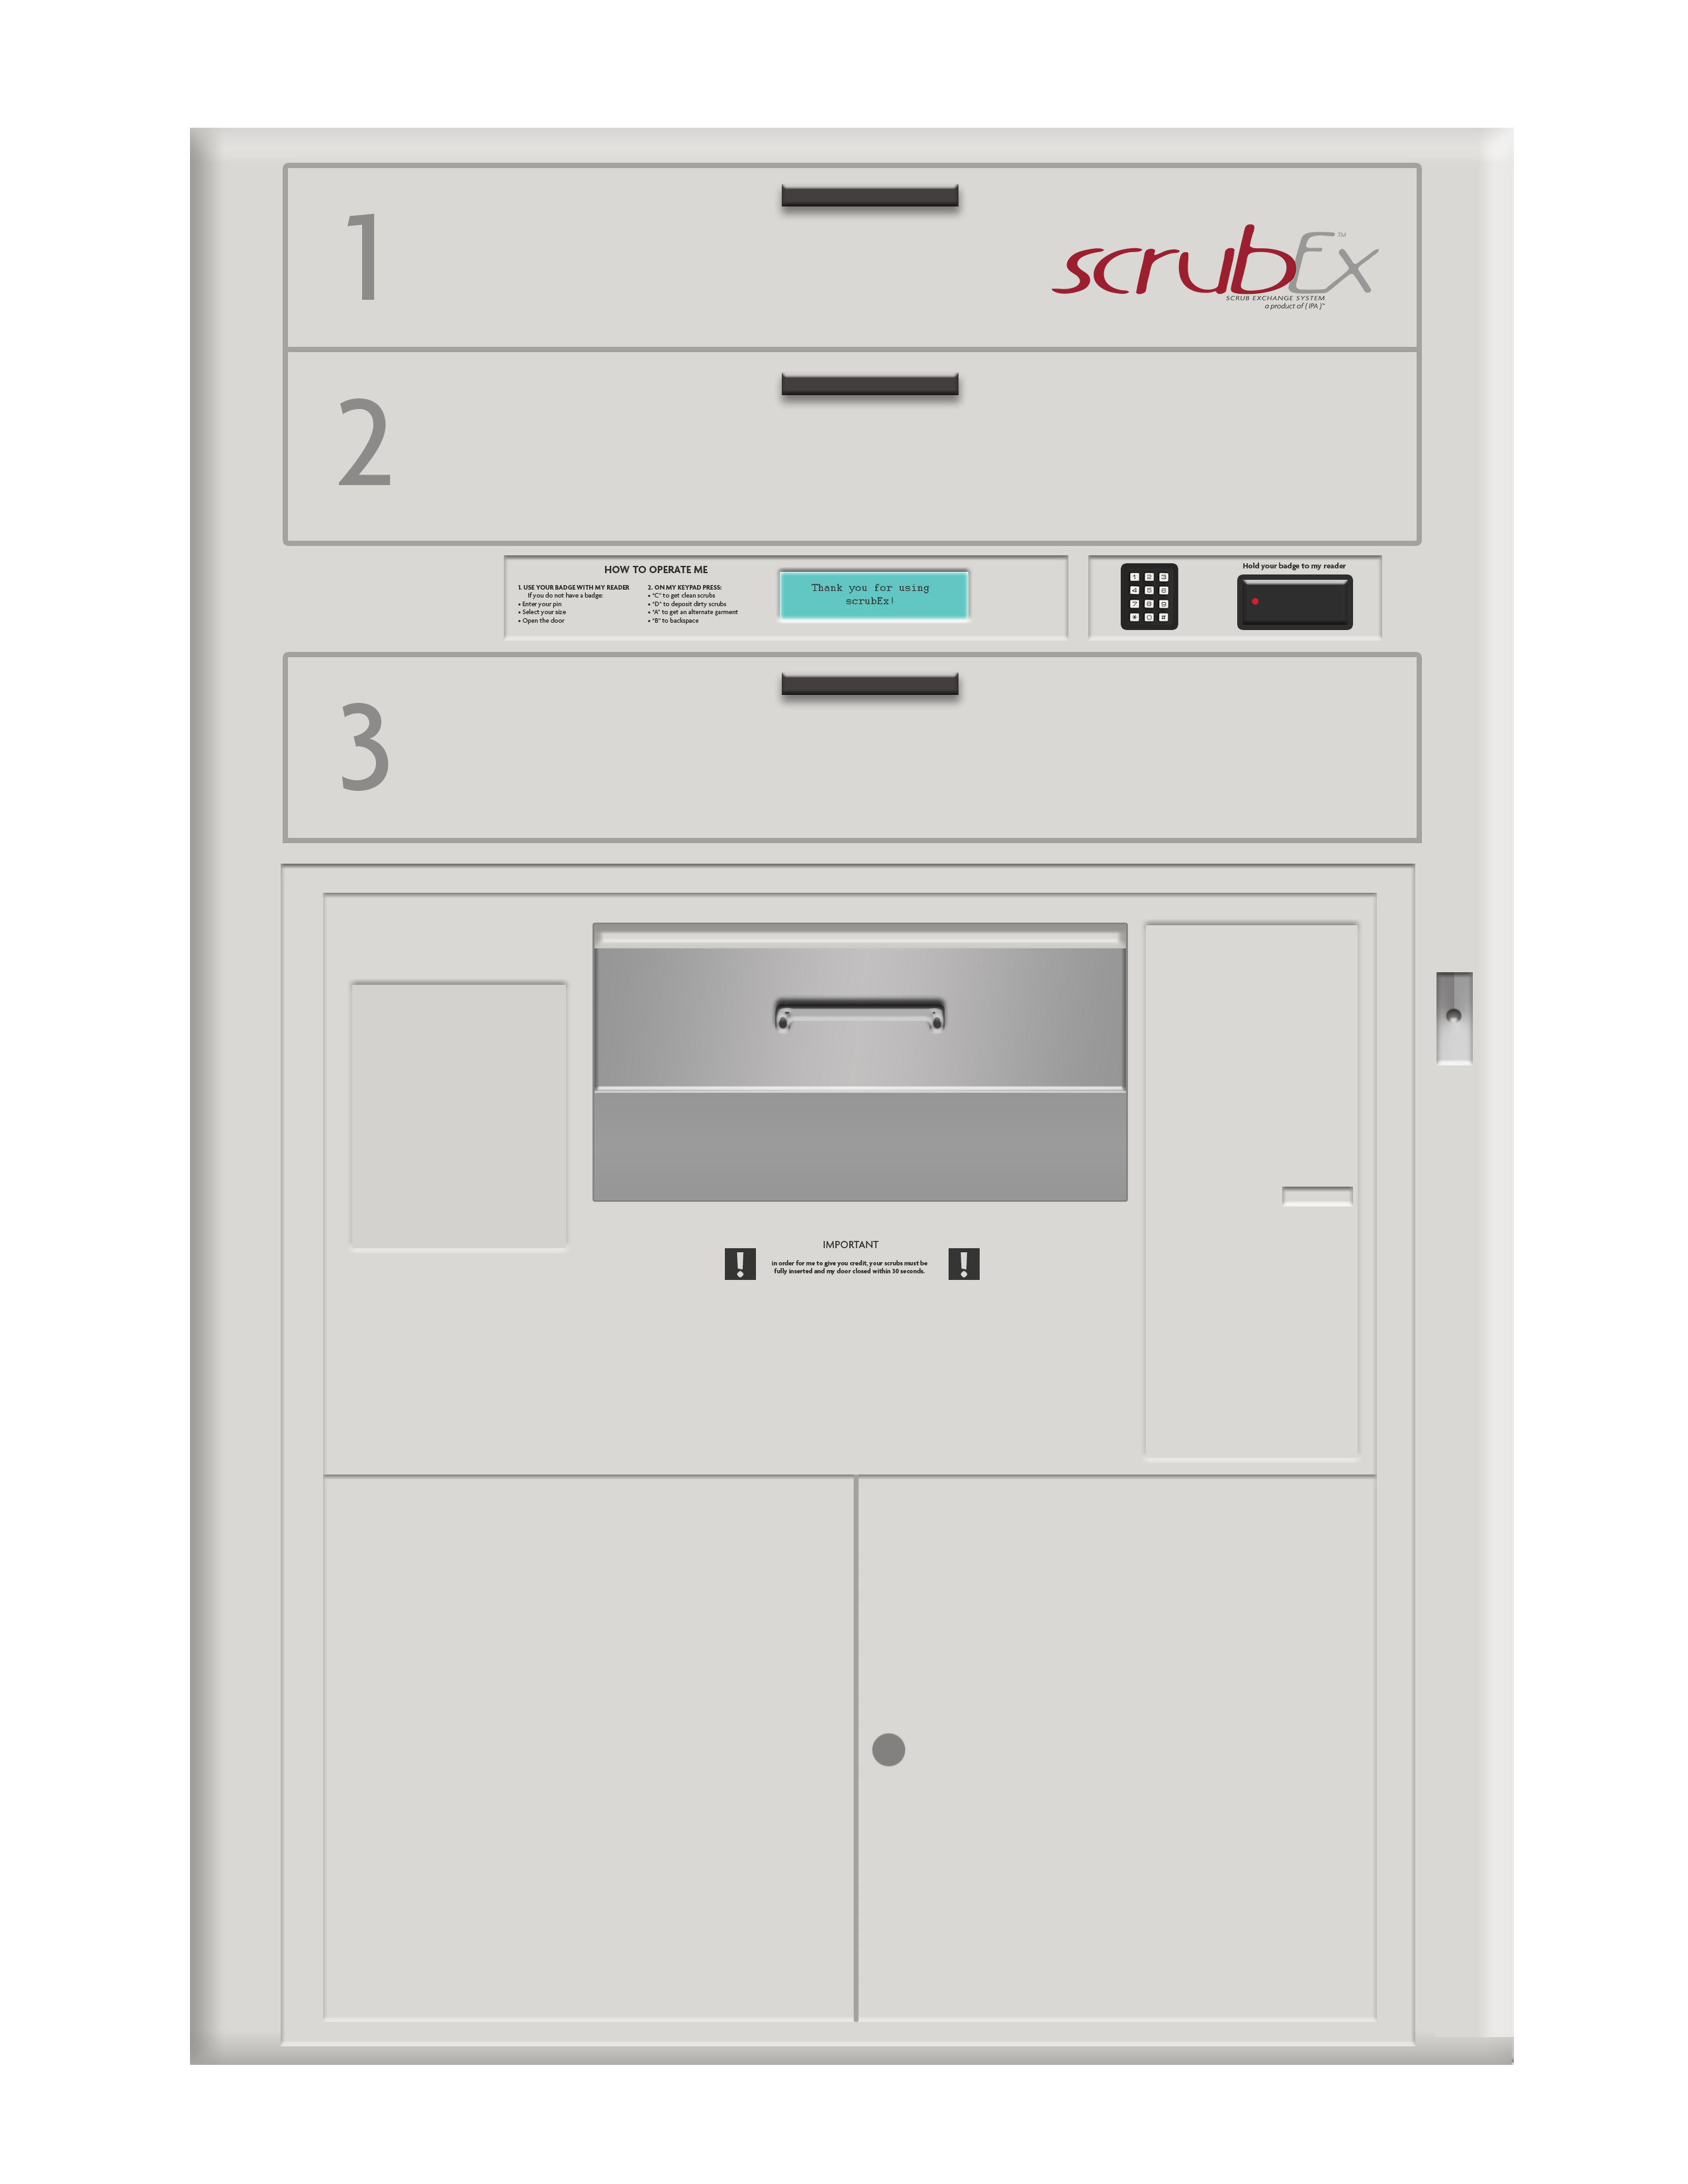 scrubex machine